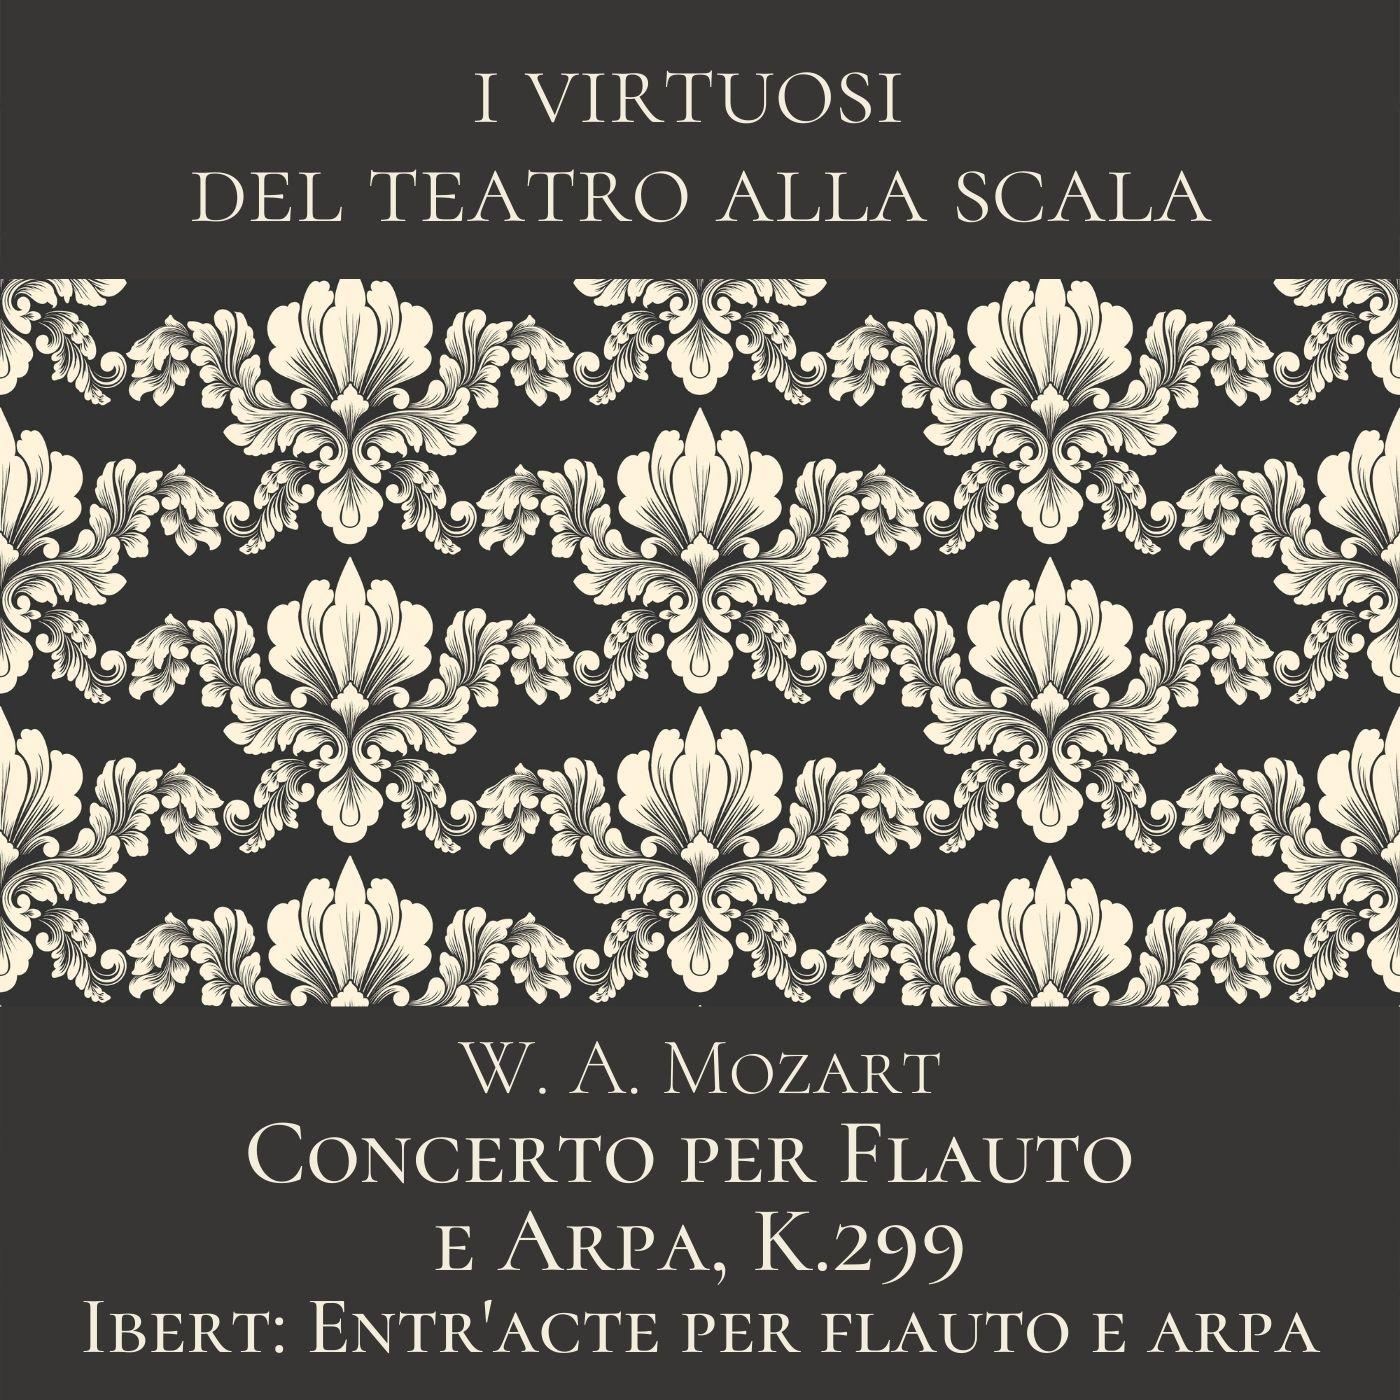 Mozart: Concerto per flauto e arpa, K. 299 - Ibert: Entr'acte per flauto e arpa